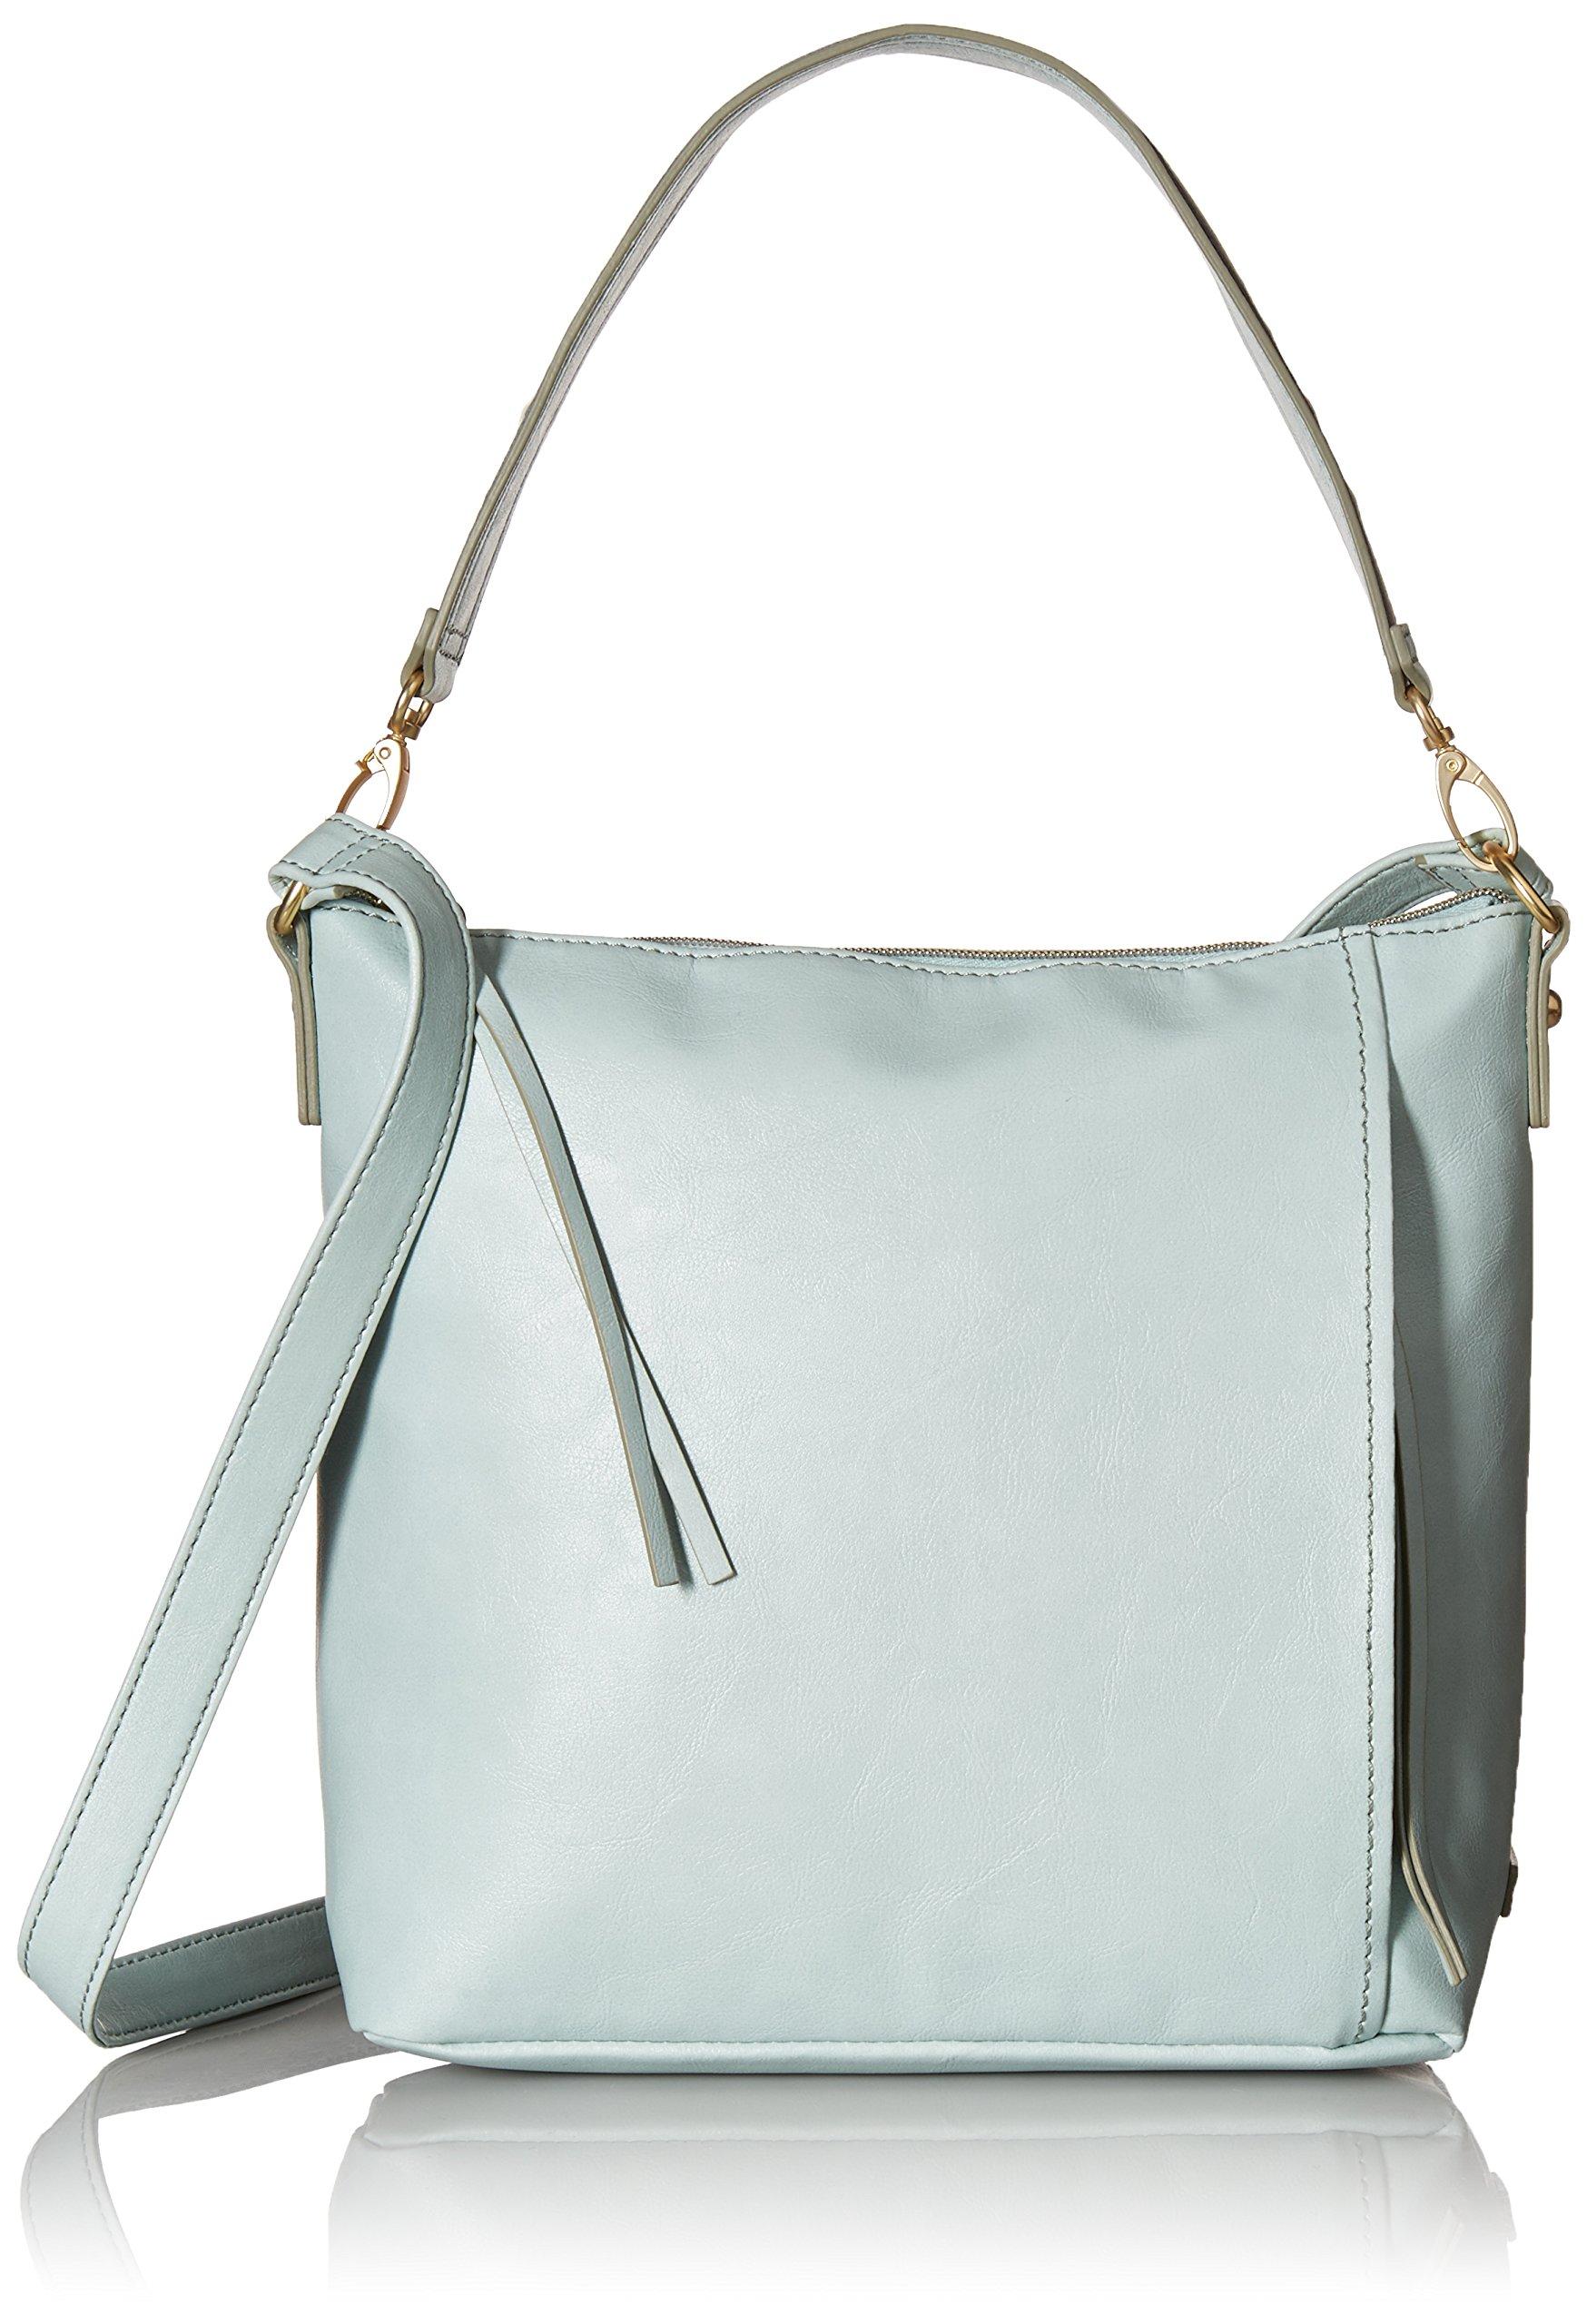 Relic Colby Convertible Crossbody Bag, Sea Glass